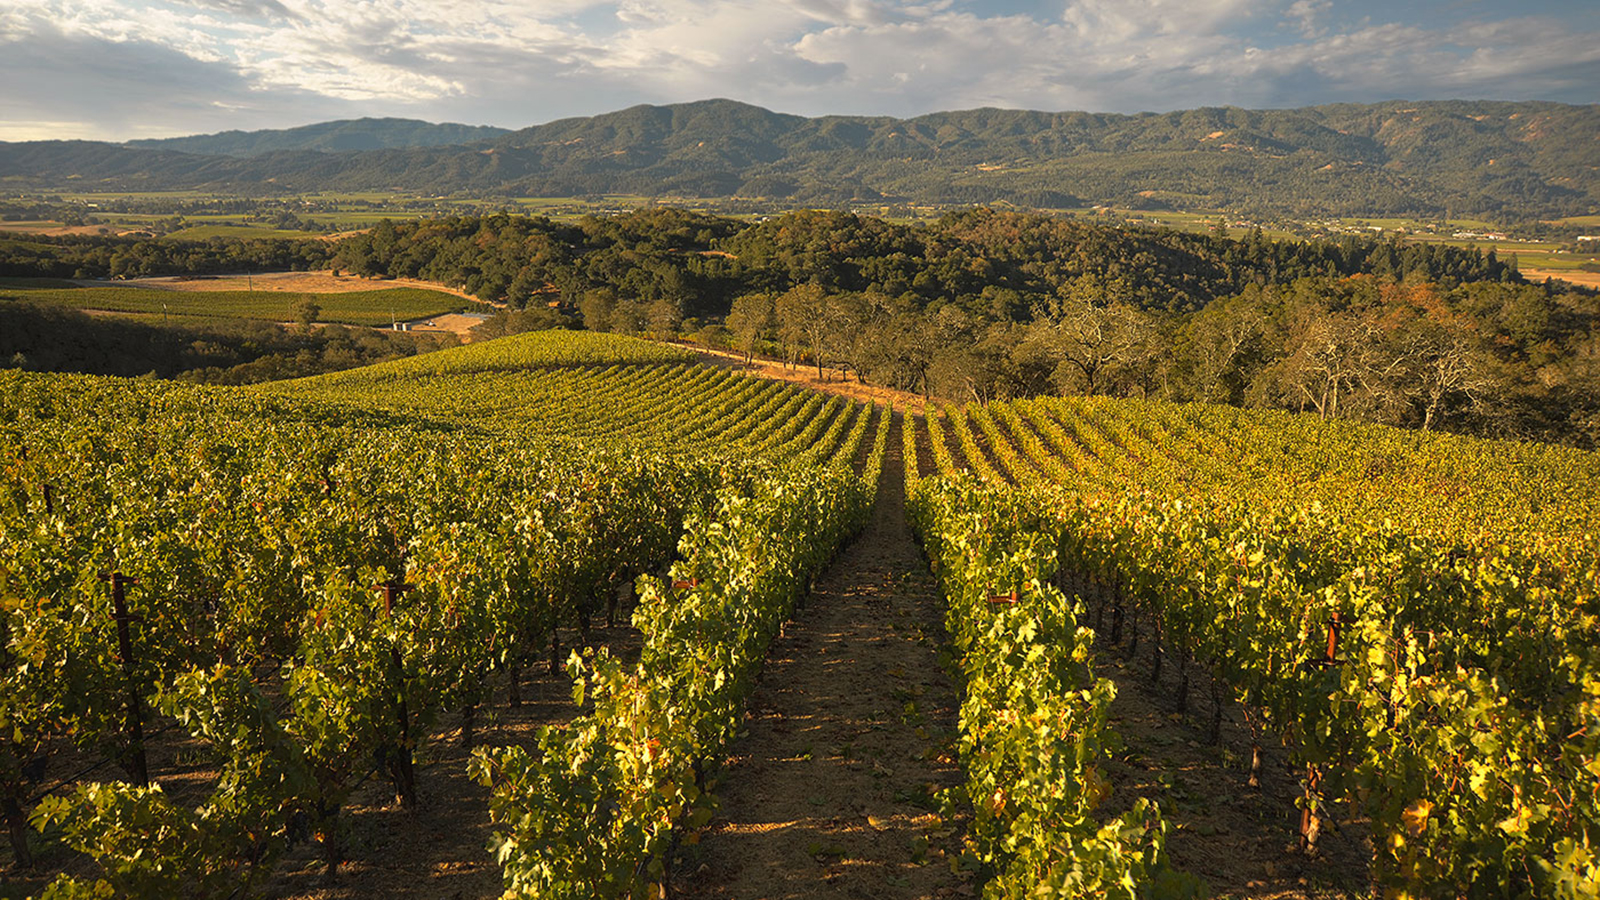 Wine Refrigerator Reviews Wine Spectator 12 rock star merlot wines from california | tasting highlights